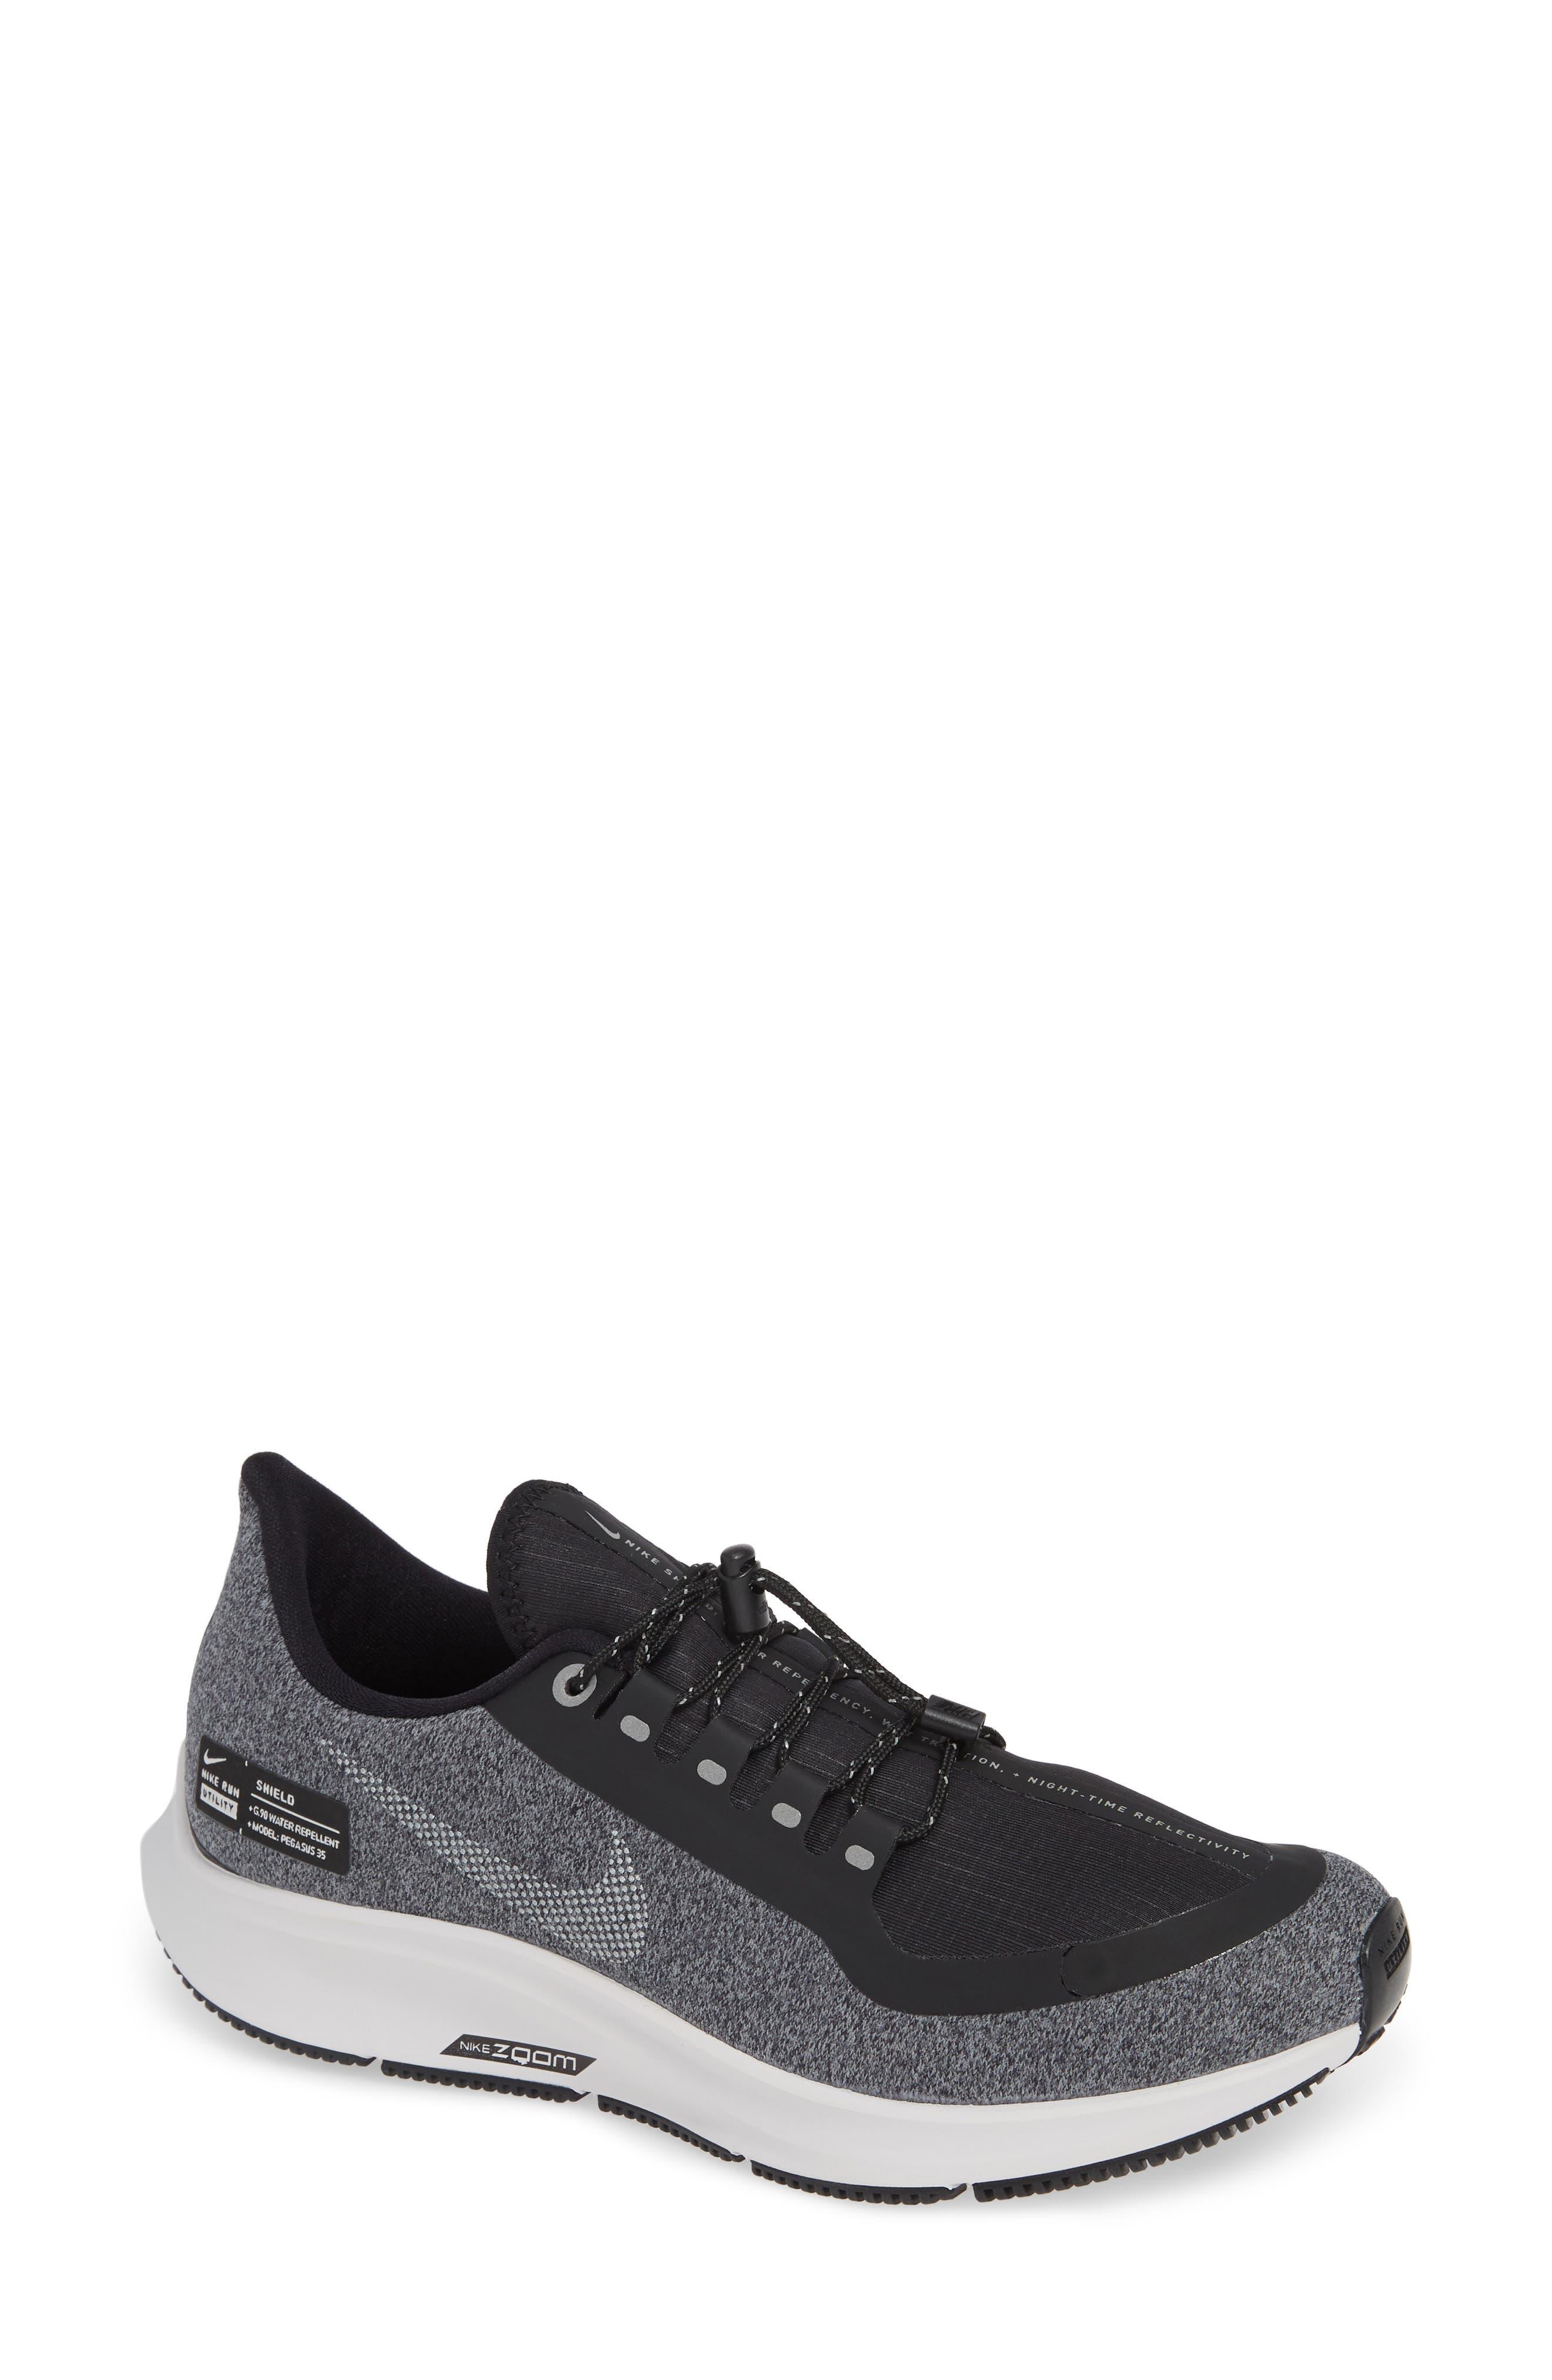 Air Zoom Pegasus 35 Shield GS Water Repellent Running Shoe, Main, color, BLACK/ WHITE-COOL GREY-GREY